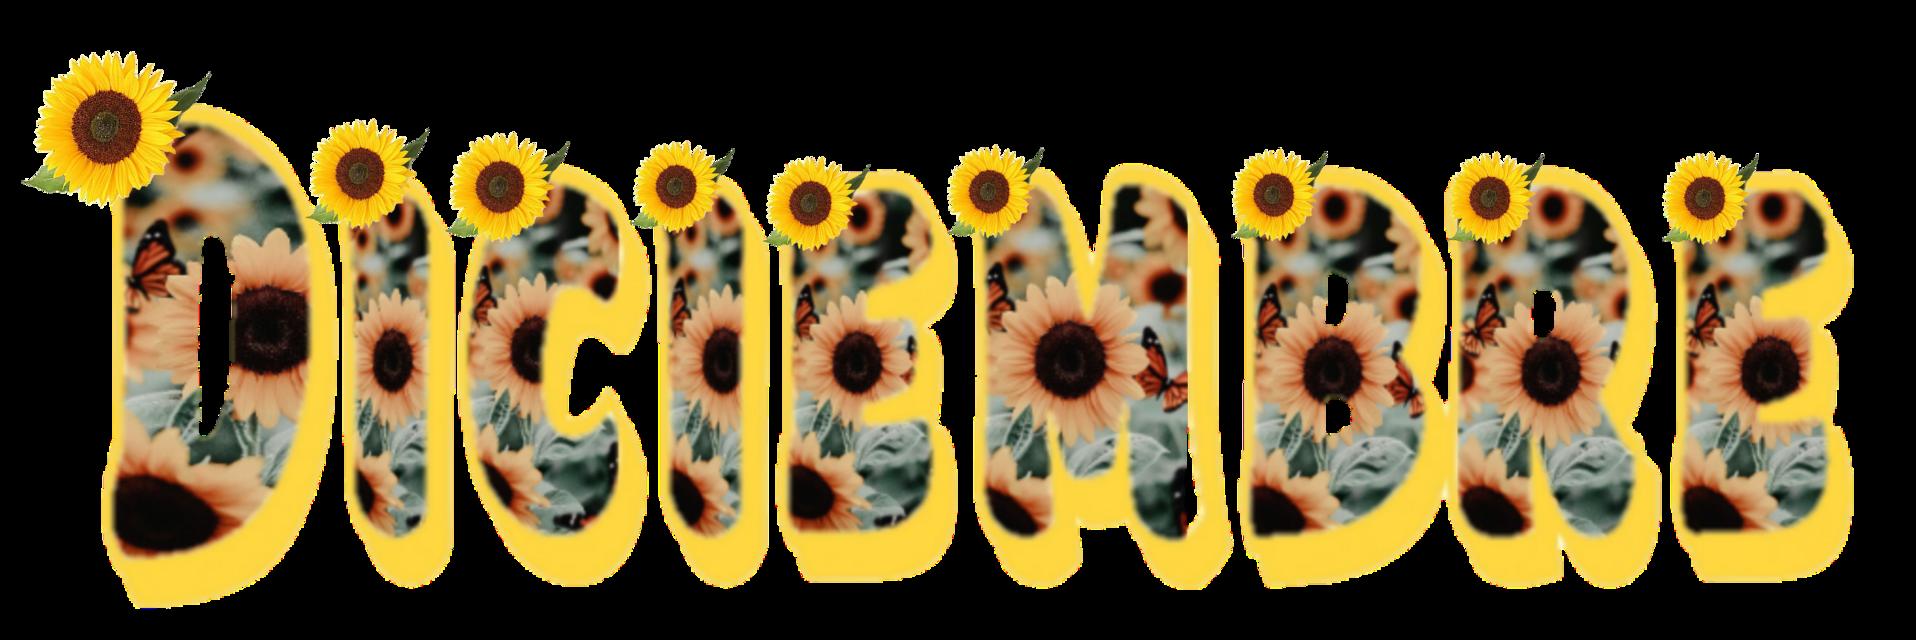 Diciembre #diciembre #december #decembercalendar #girasol #girassol #girassol🌻  #girasol🌻 #girasole  #girasoles🌻 #girasoles  #sunflower #sunflowers #sunflowersticker #framephotograph #framedpicture #stickers #freetoedit #hermoso #beautiful